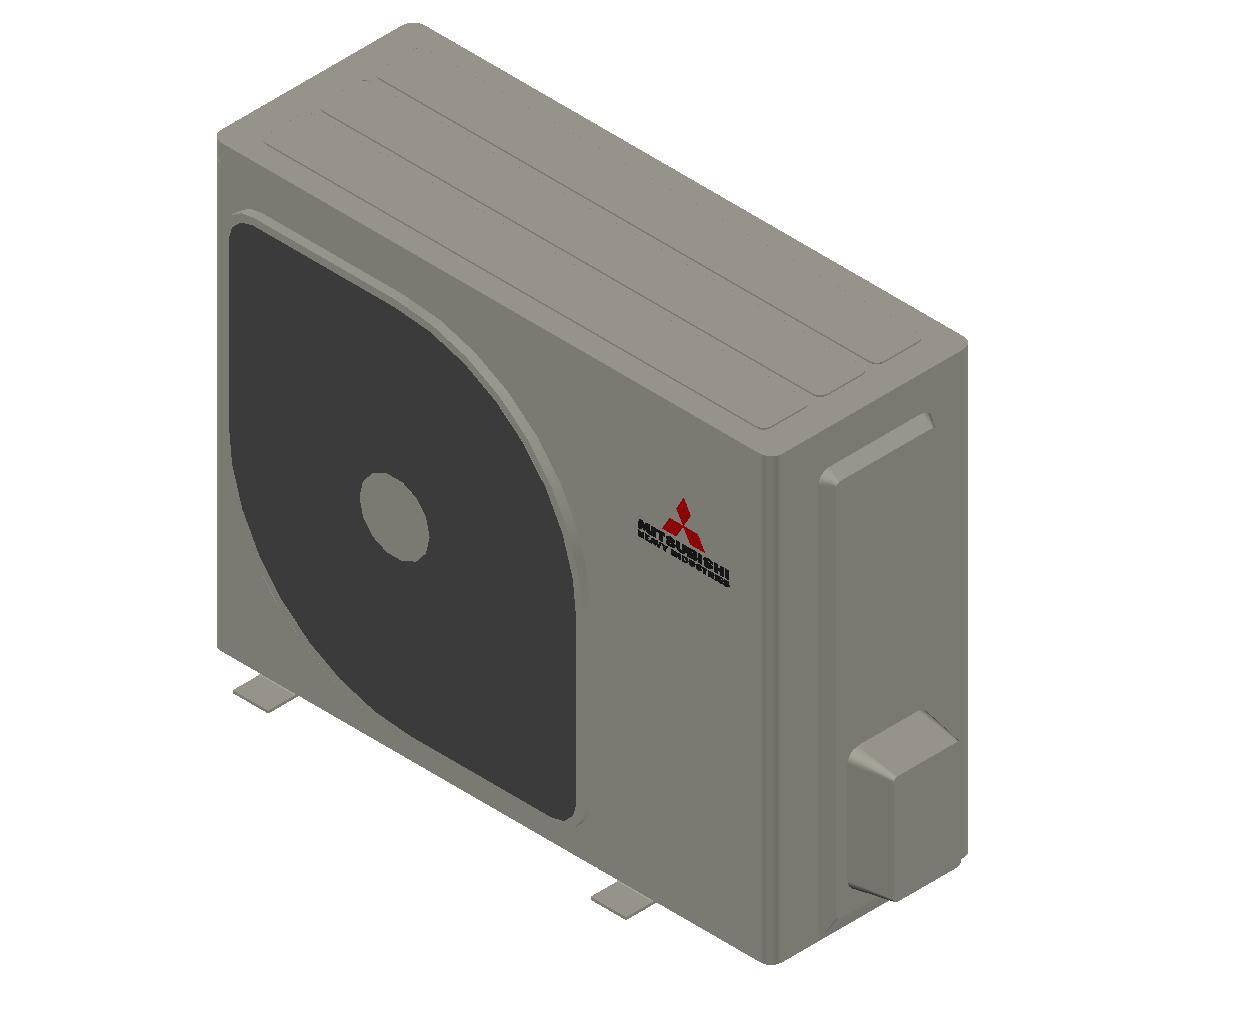 HC_Heat Pump_MEPcontent_Mitsubishi Heavy Industries_PAC-RAC_SRC35ZSX-S_INT-EN.dwg